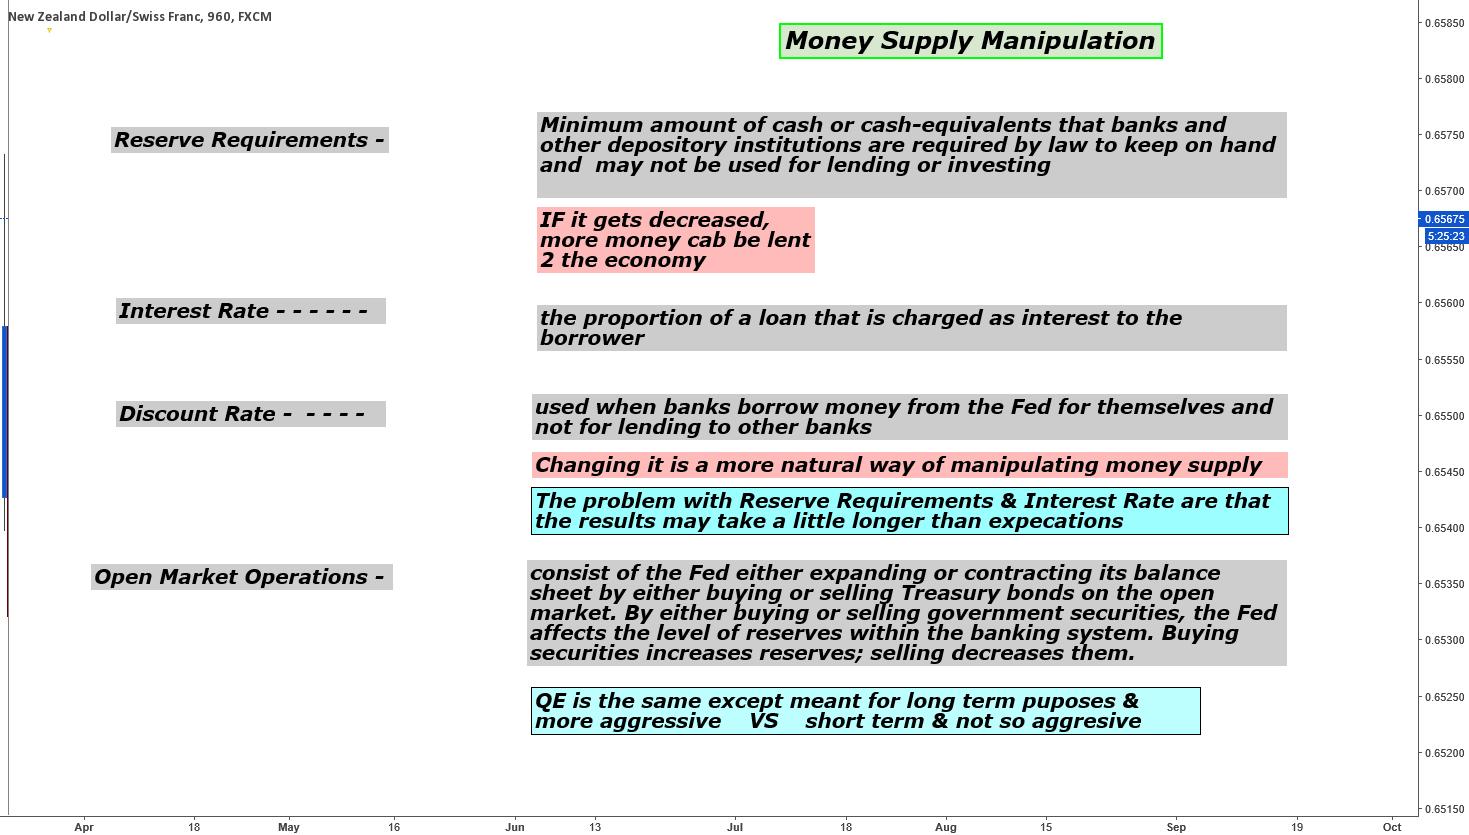 Money Supply Manipulation